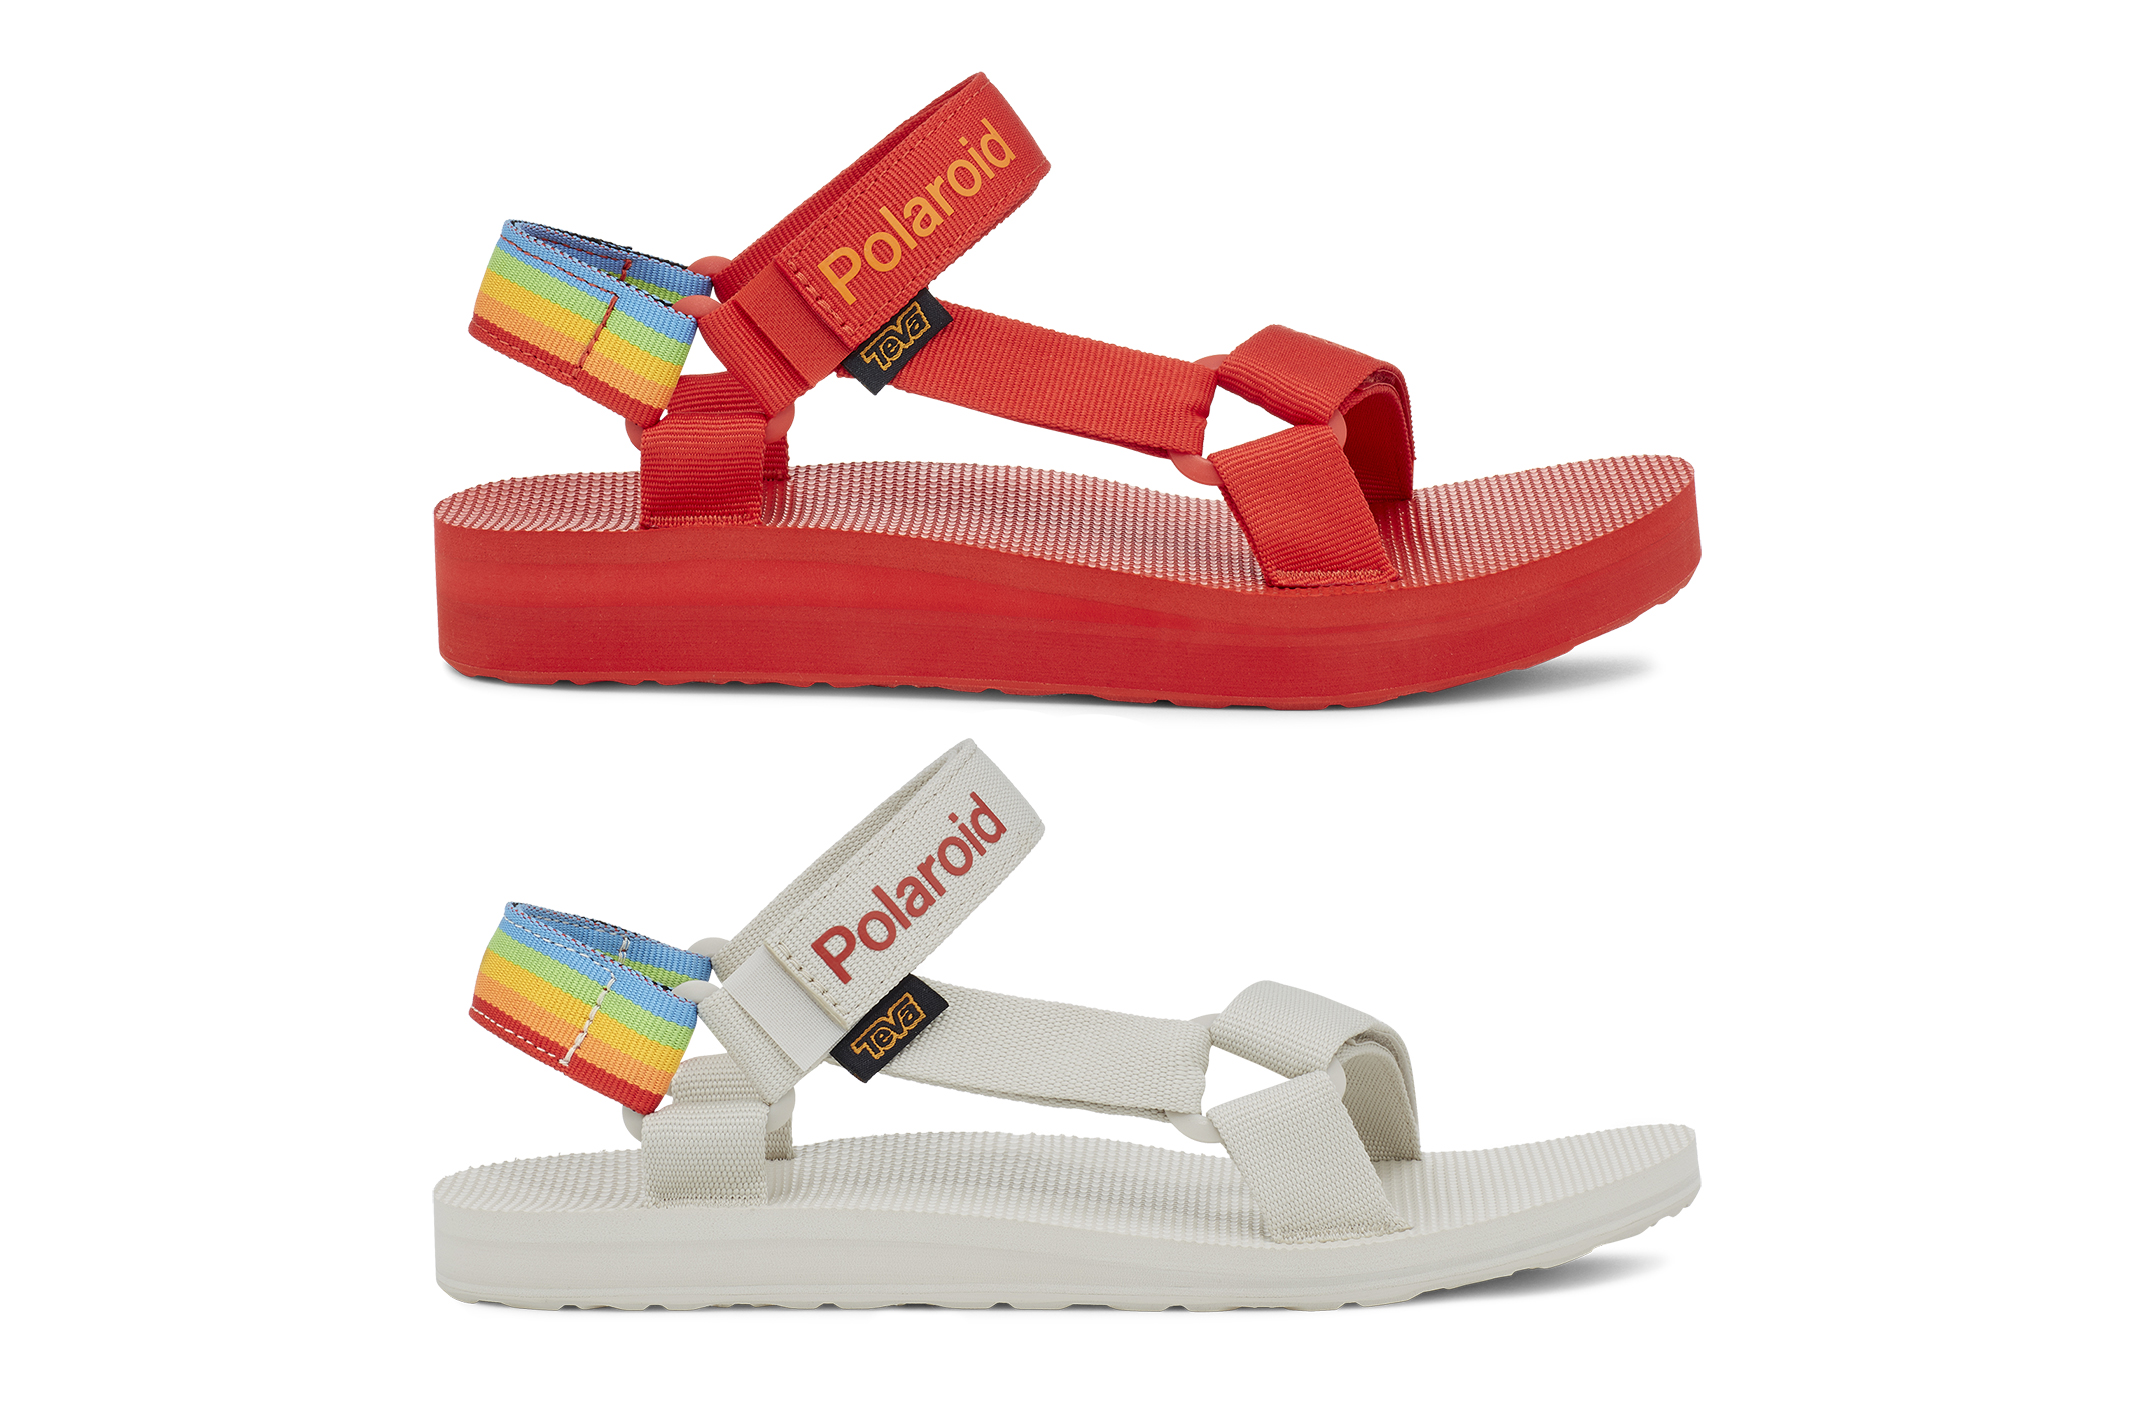 Teva x Polaroid sandals